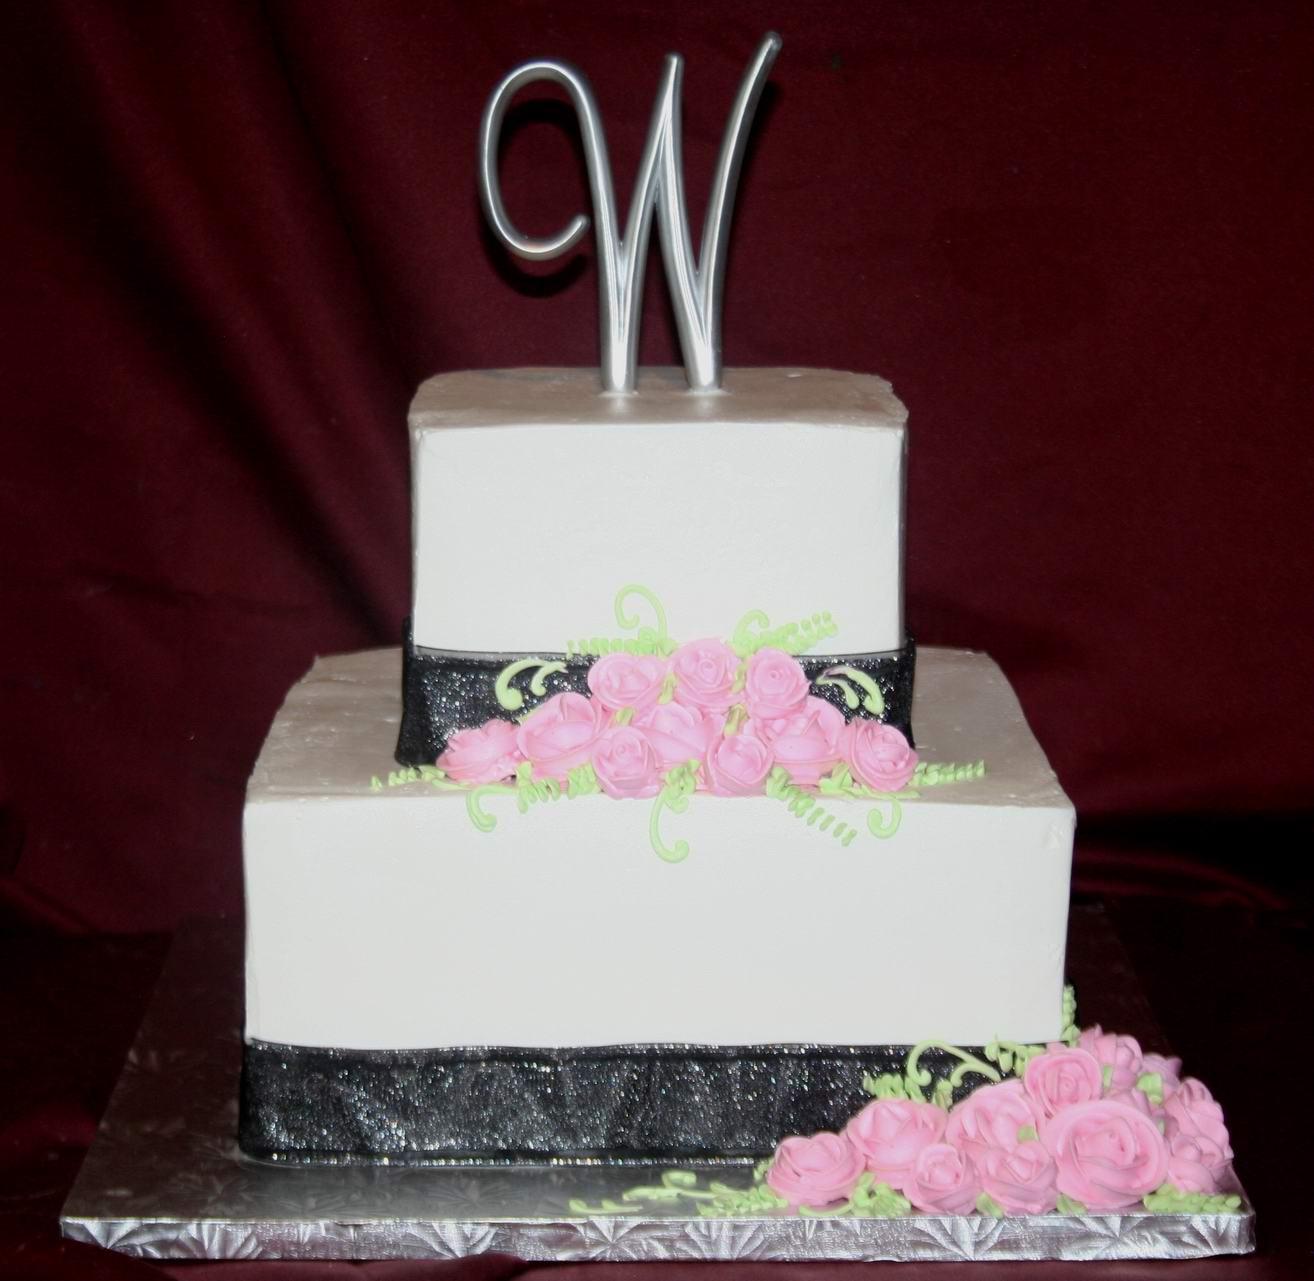 8 Photos of Simple 3 Tier Square Wedding Cakes